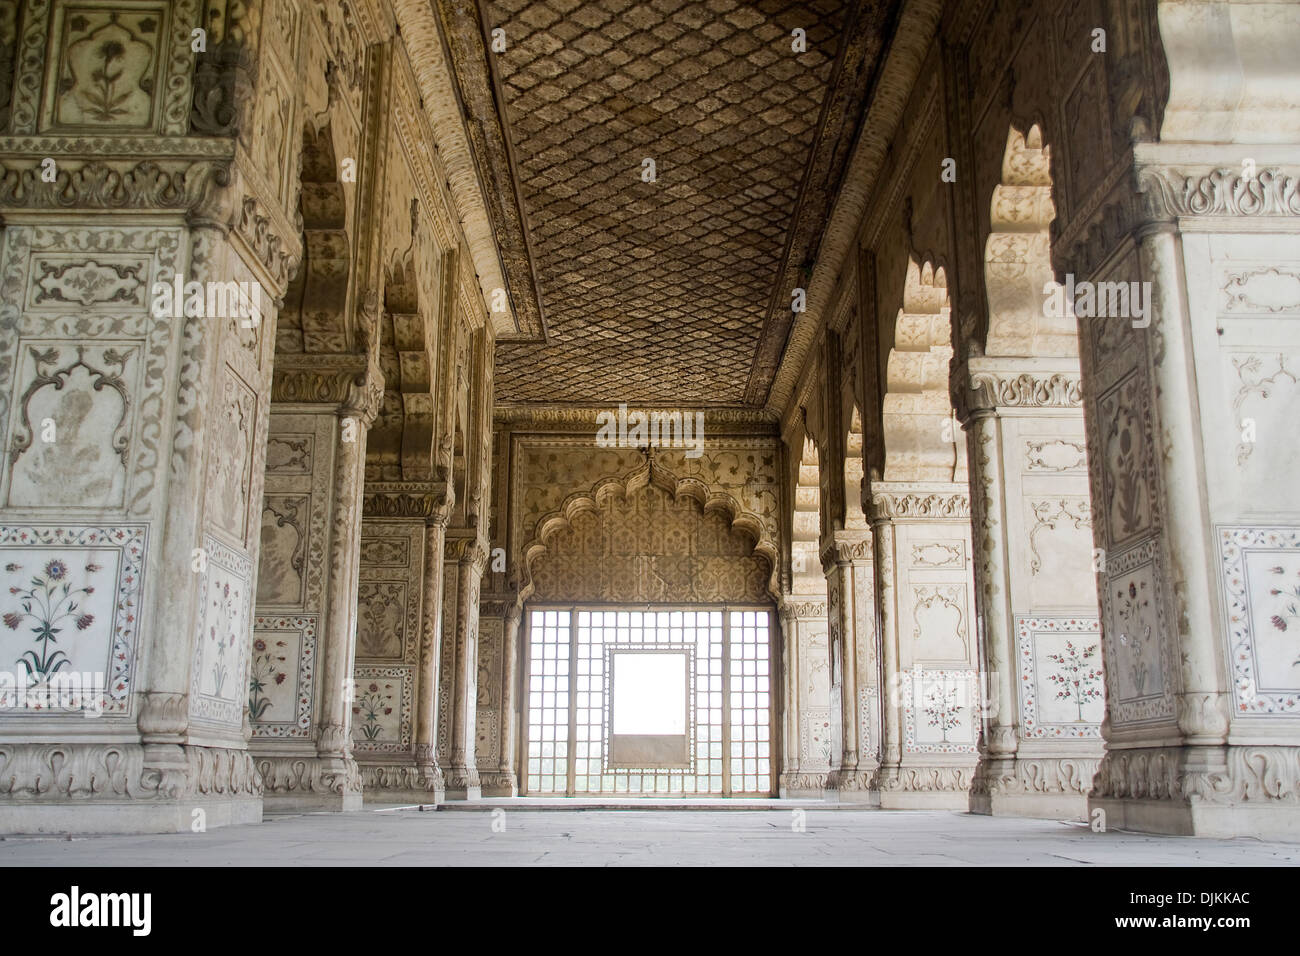 Marble inlay on pillars of Diwan-E-Khas at Red Fort, Delhi, Inida, Asia - Stock Image